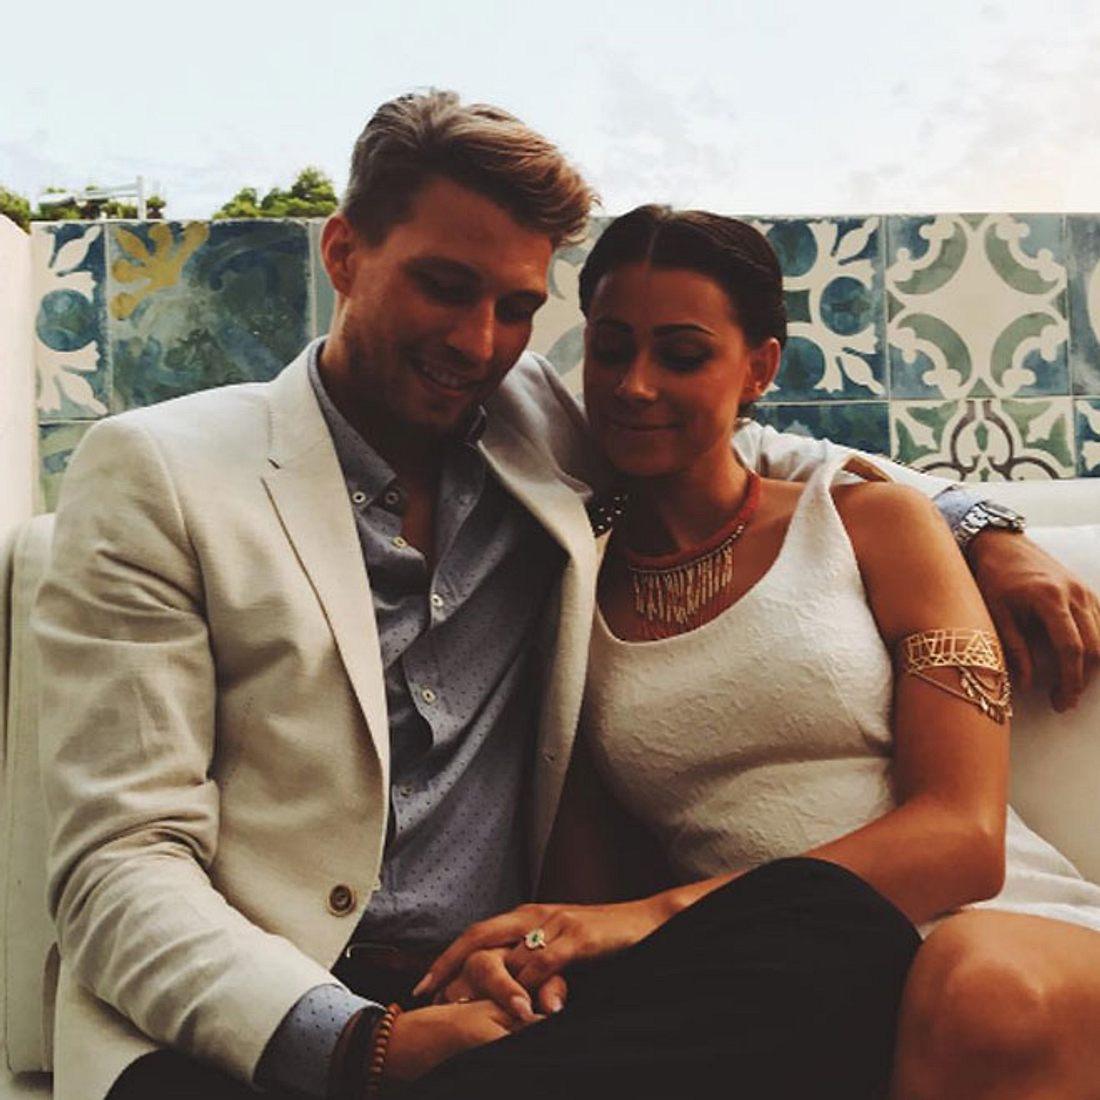 Raul Richter: Ist er schon verlobt?